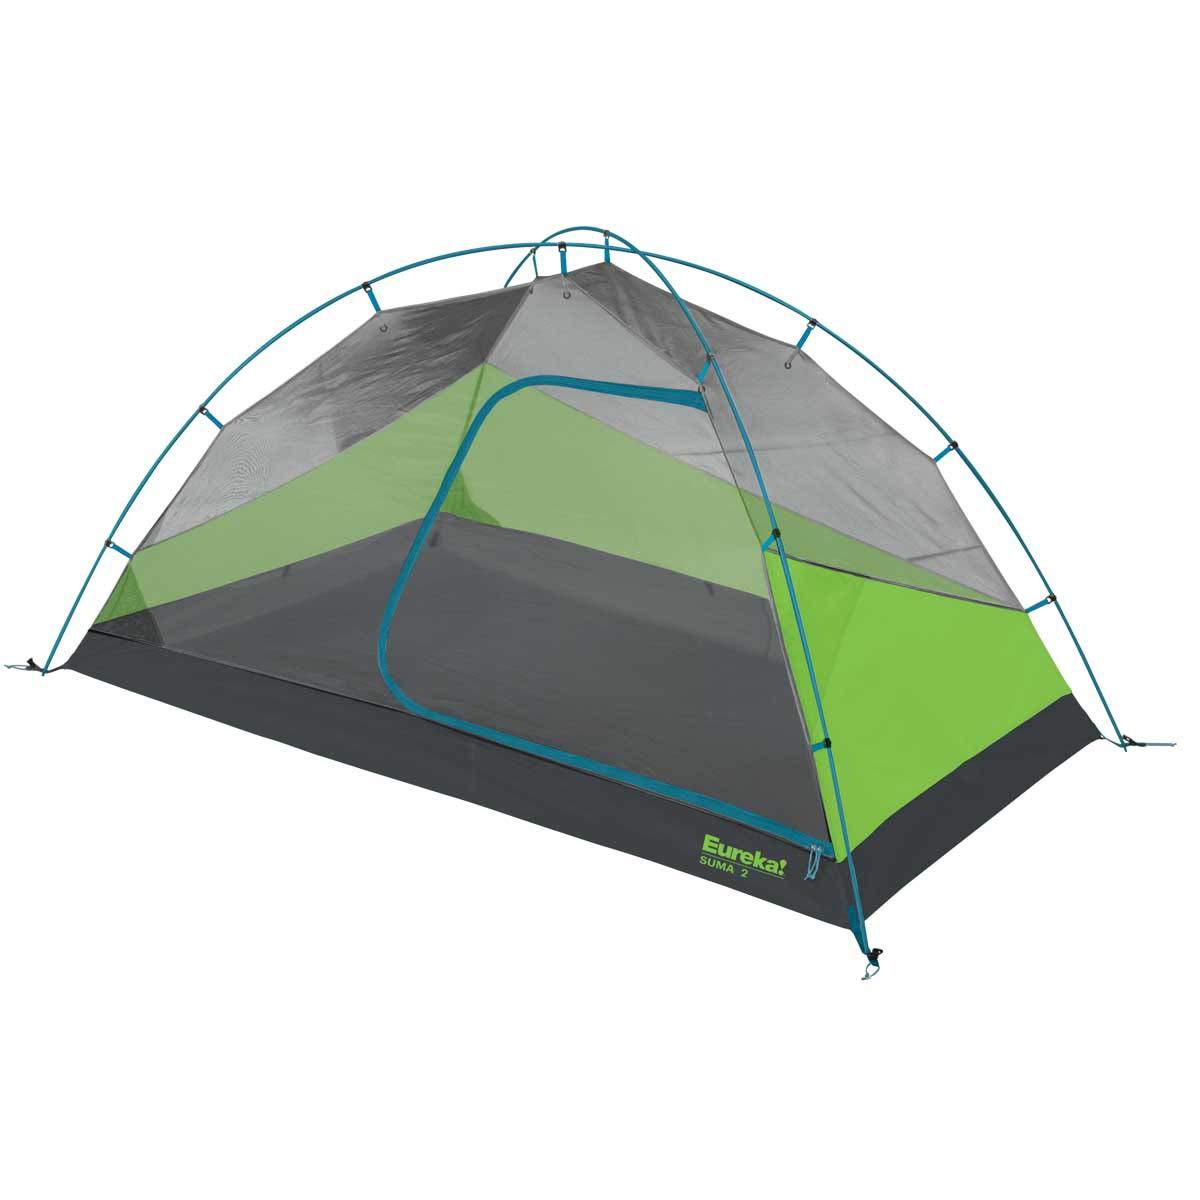 Suma 2 Two-Person Backpacking Tent Sports u0026 Outdoors  sc 1 st  Amazon.com & Amazon.com: Eureka! Suma 2 Two-Person Backpacking Tent: Sports ...